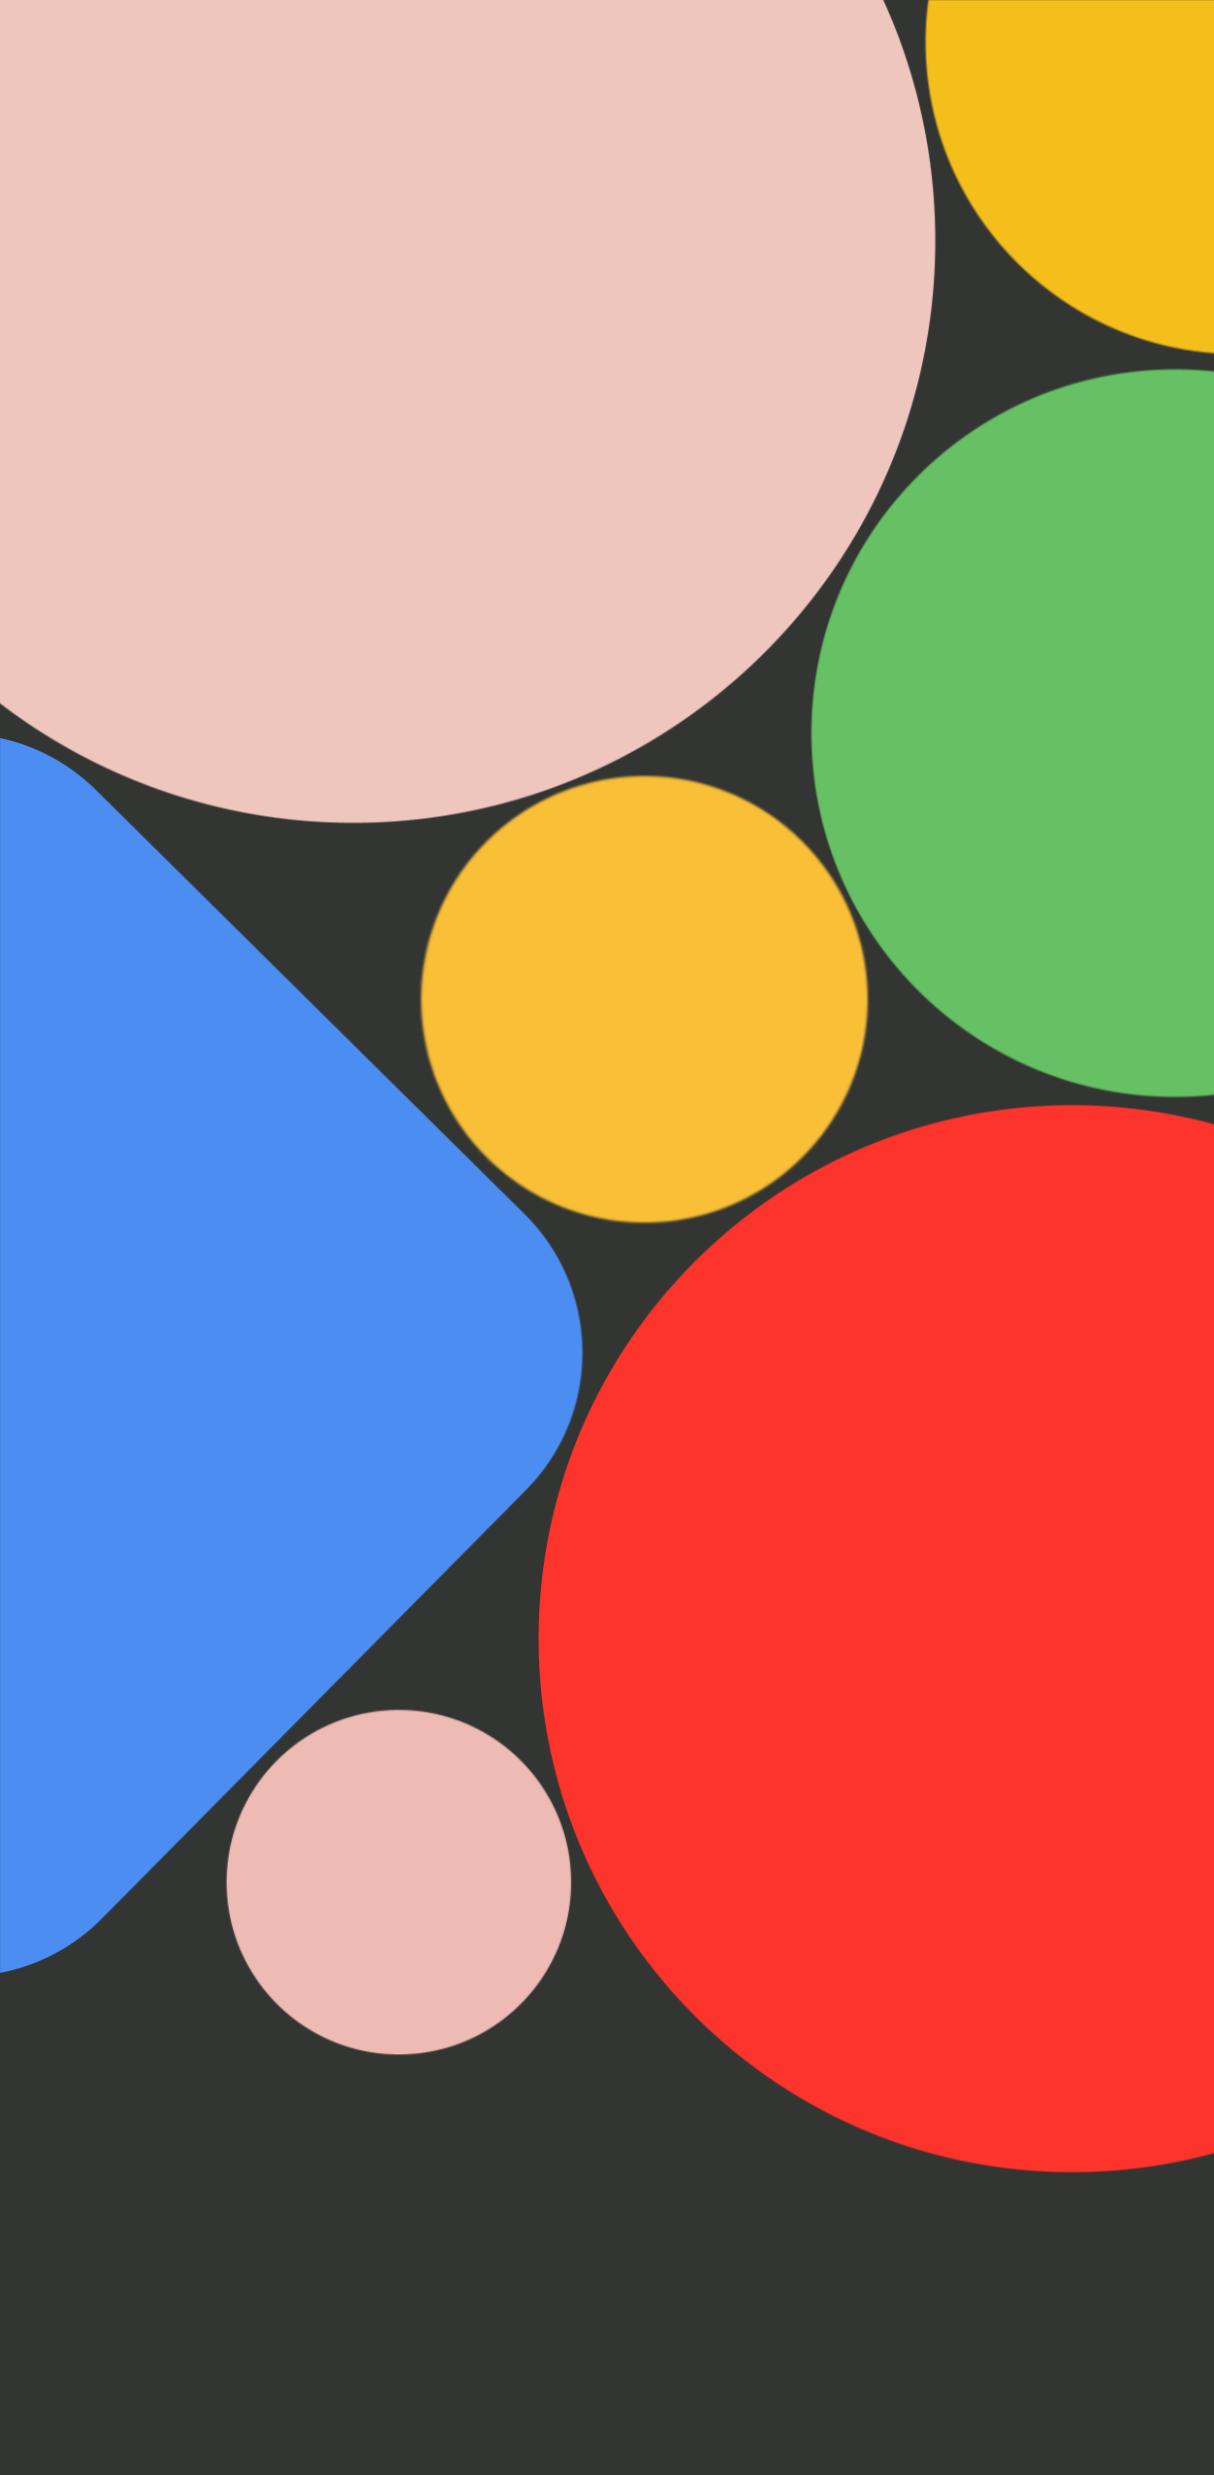 Pixel 4a Wallpaper In 2020 Google Pixel Wallpaper Galaxy Phone Wallpaper Stock Wallpaper